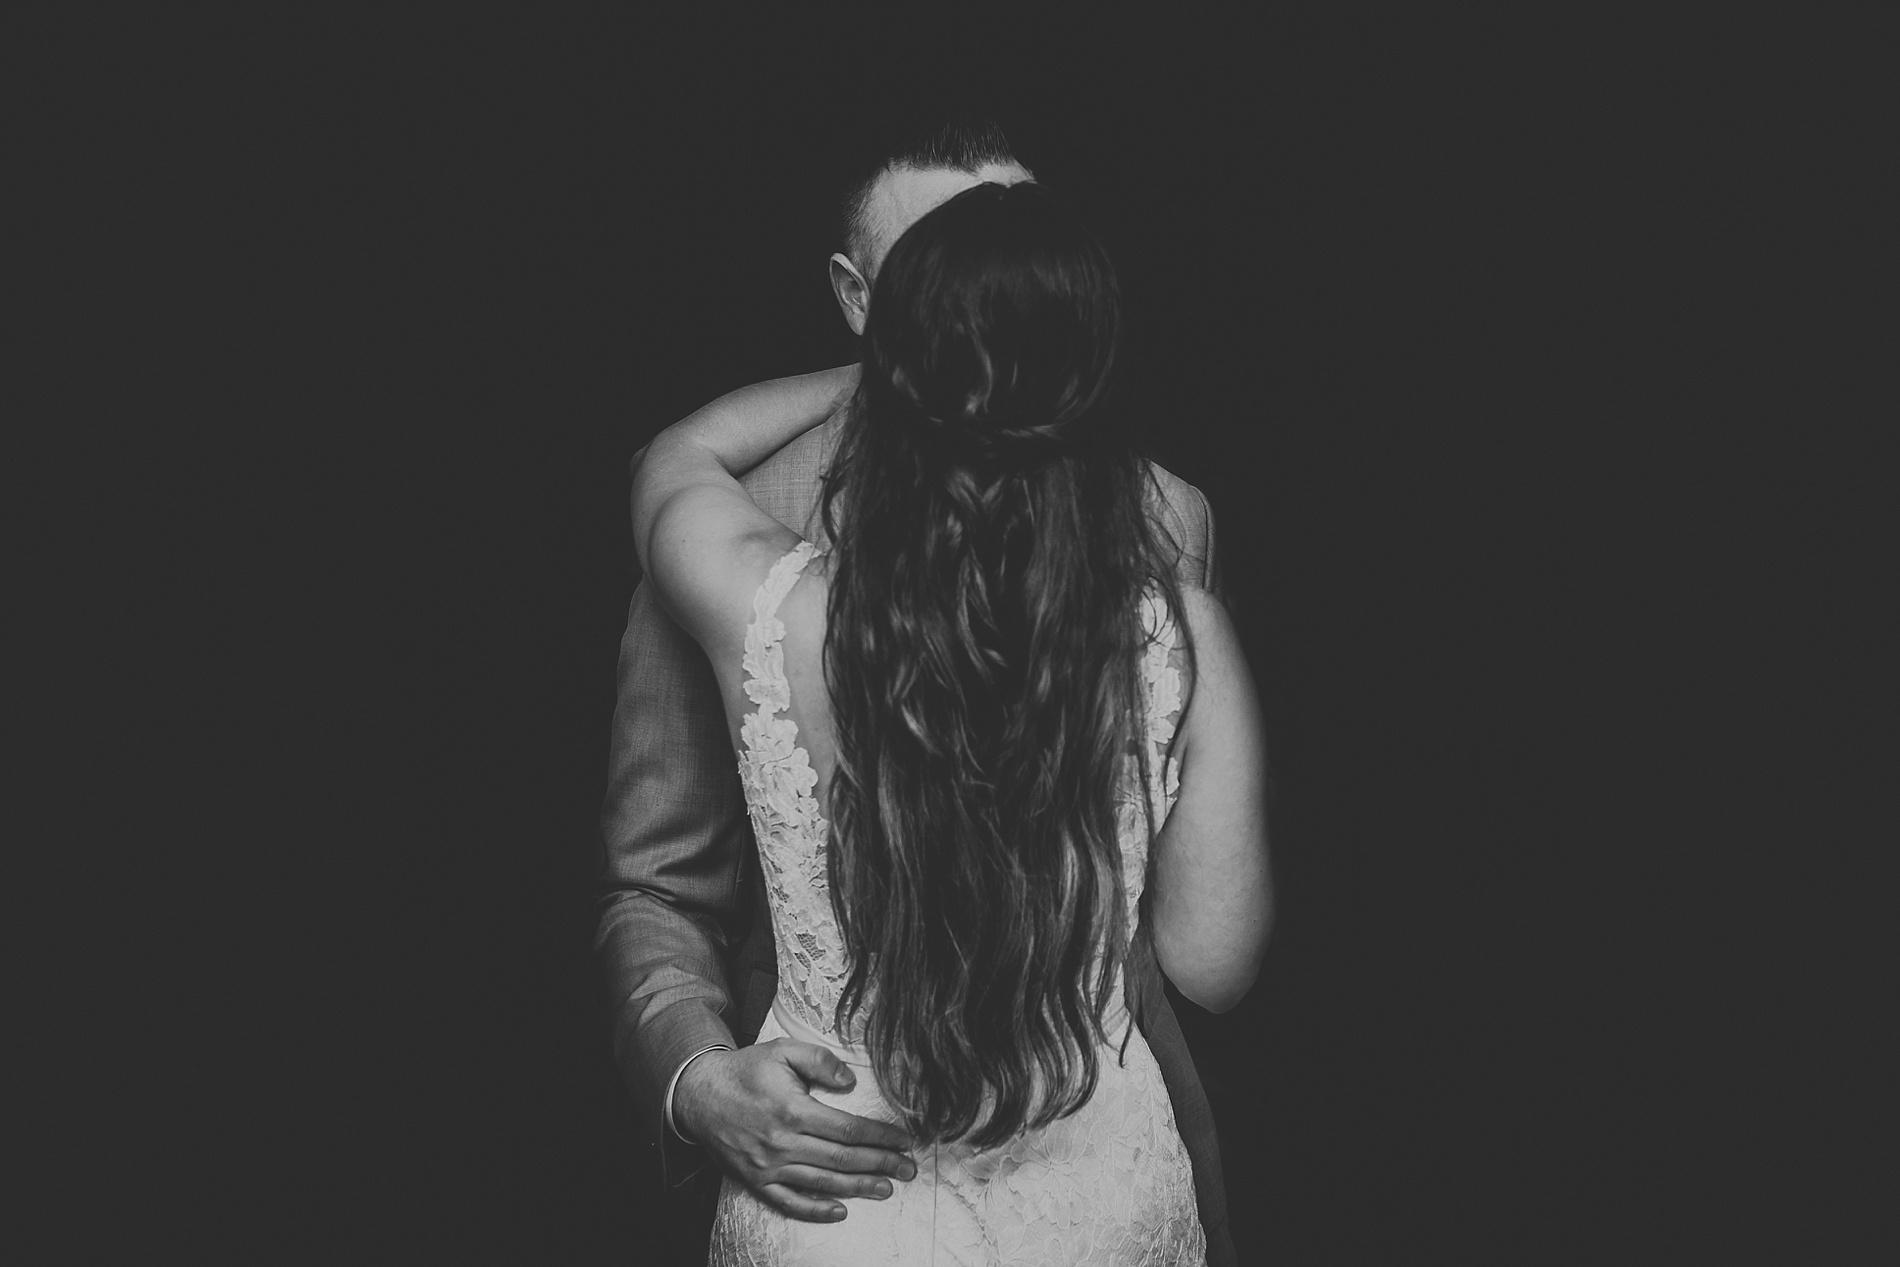 Kawartha_Lakes_Wedding_Bobcageon_Eganridge_Resort_Toronto_Photographer_0070.jpg